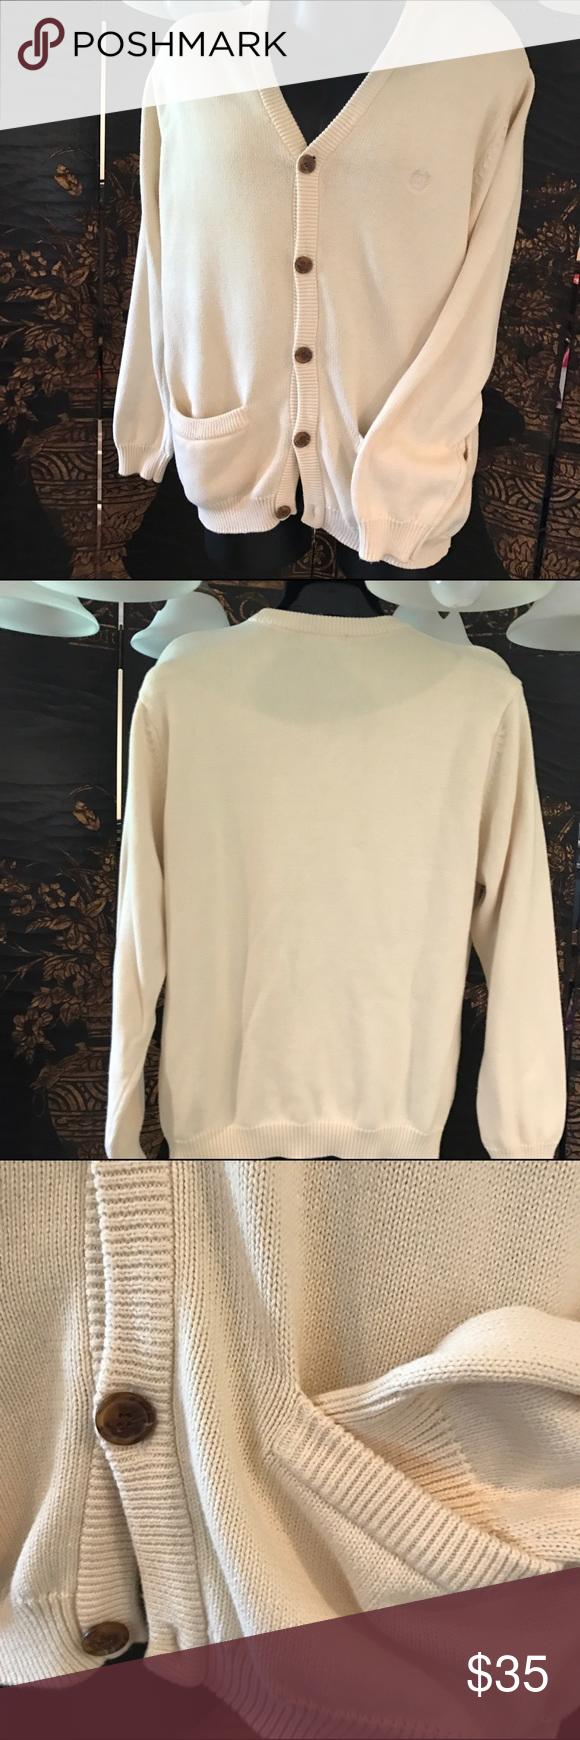 Men's Chap's knit sweater cream medium pockets Good condition ...